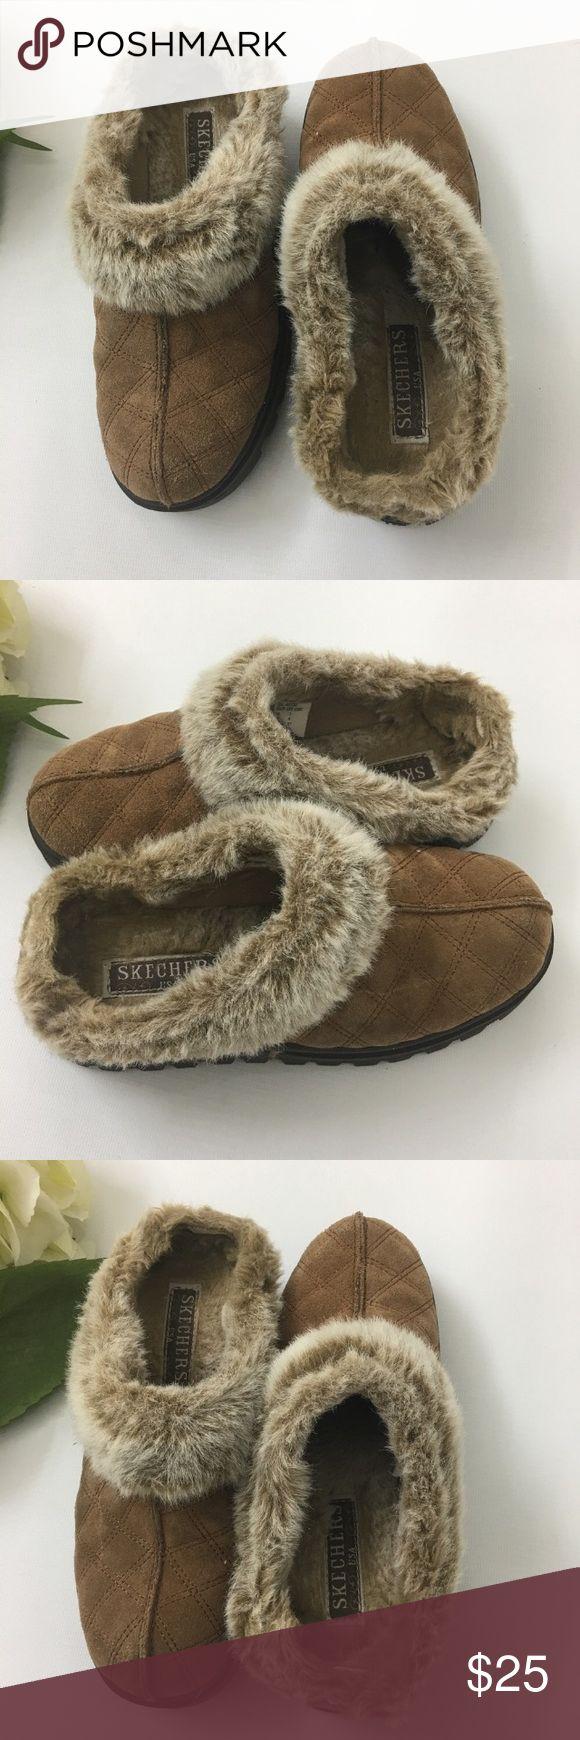 🎉 EUC - Skechers Women's Clog Slipper - Size 7 🎉 EUC - Skechers Women's Clog Slipper - Size 7 - ⬇️ WAS $25 Skechers Shoes Mules & Clogs